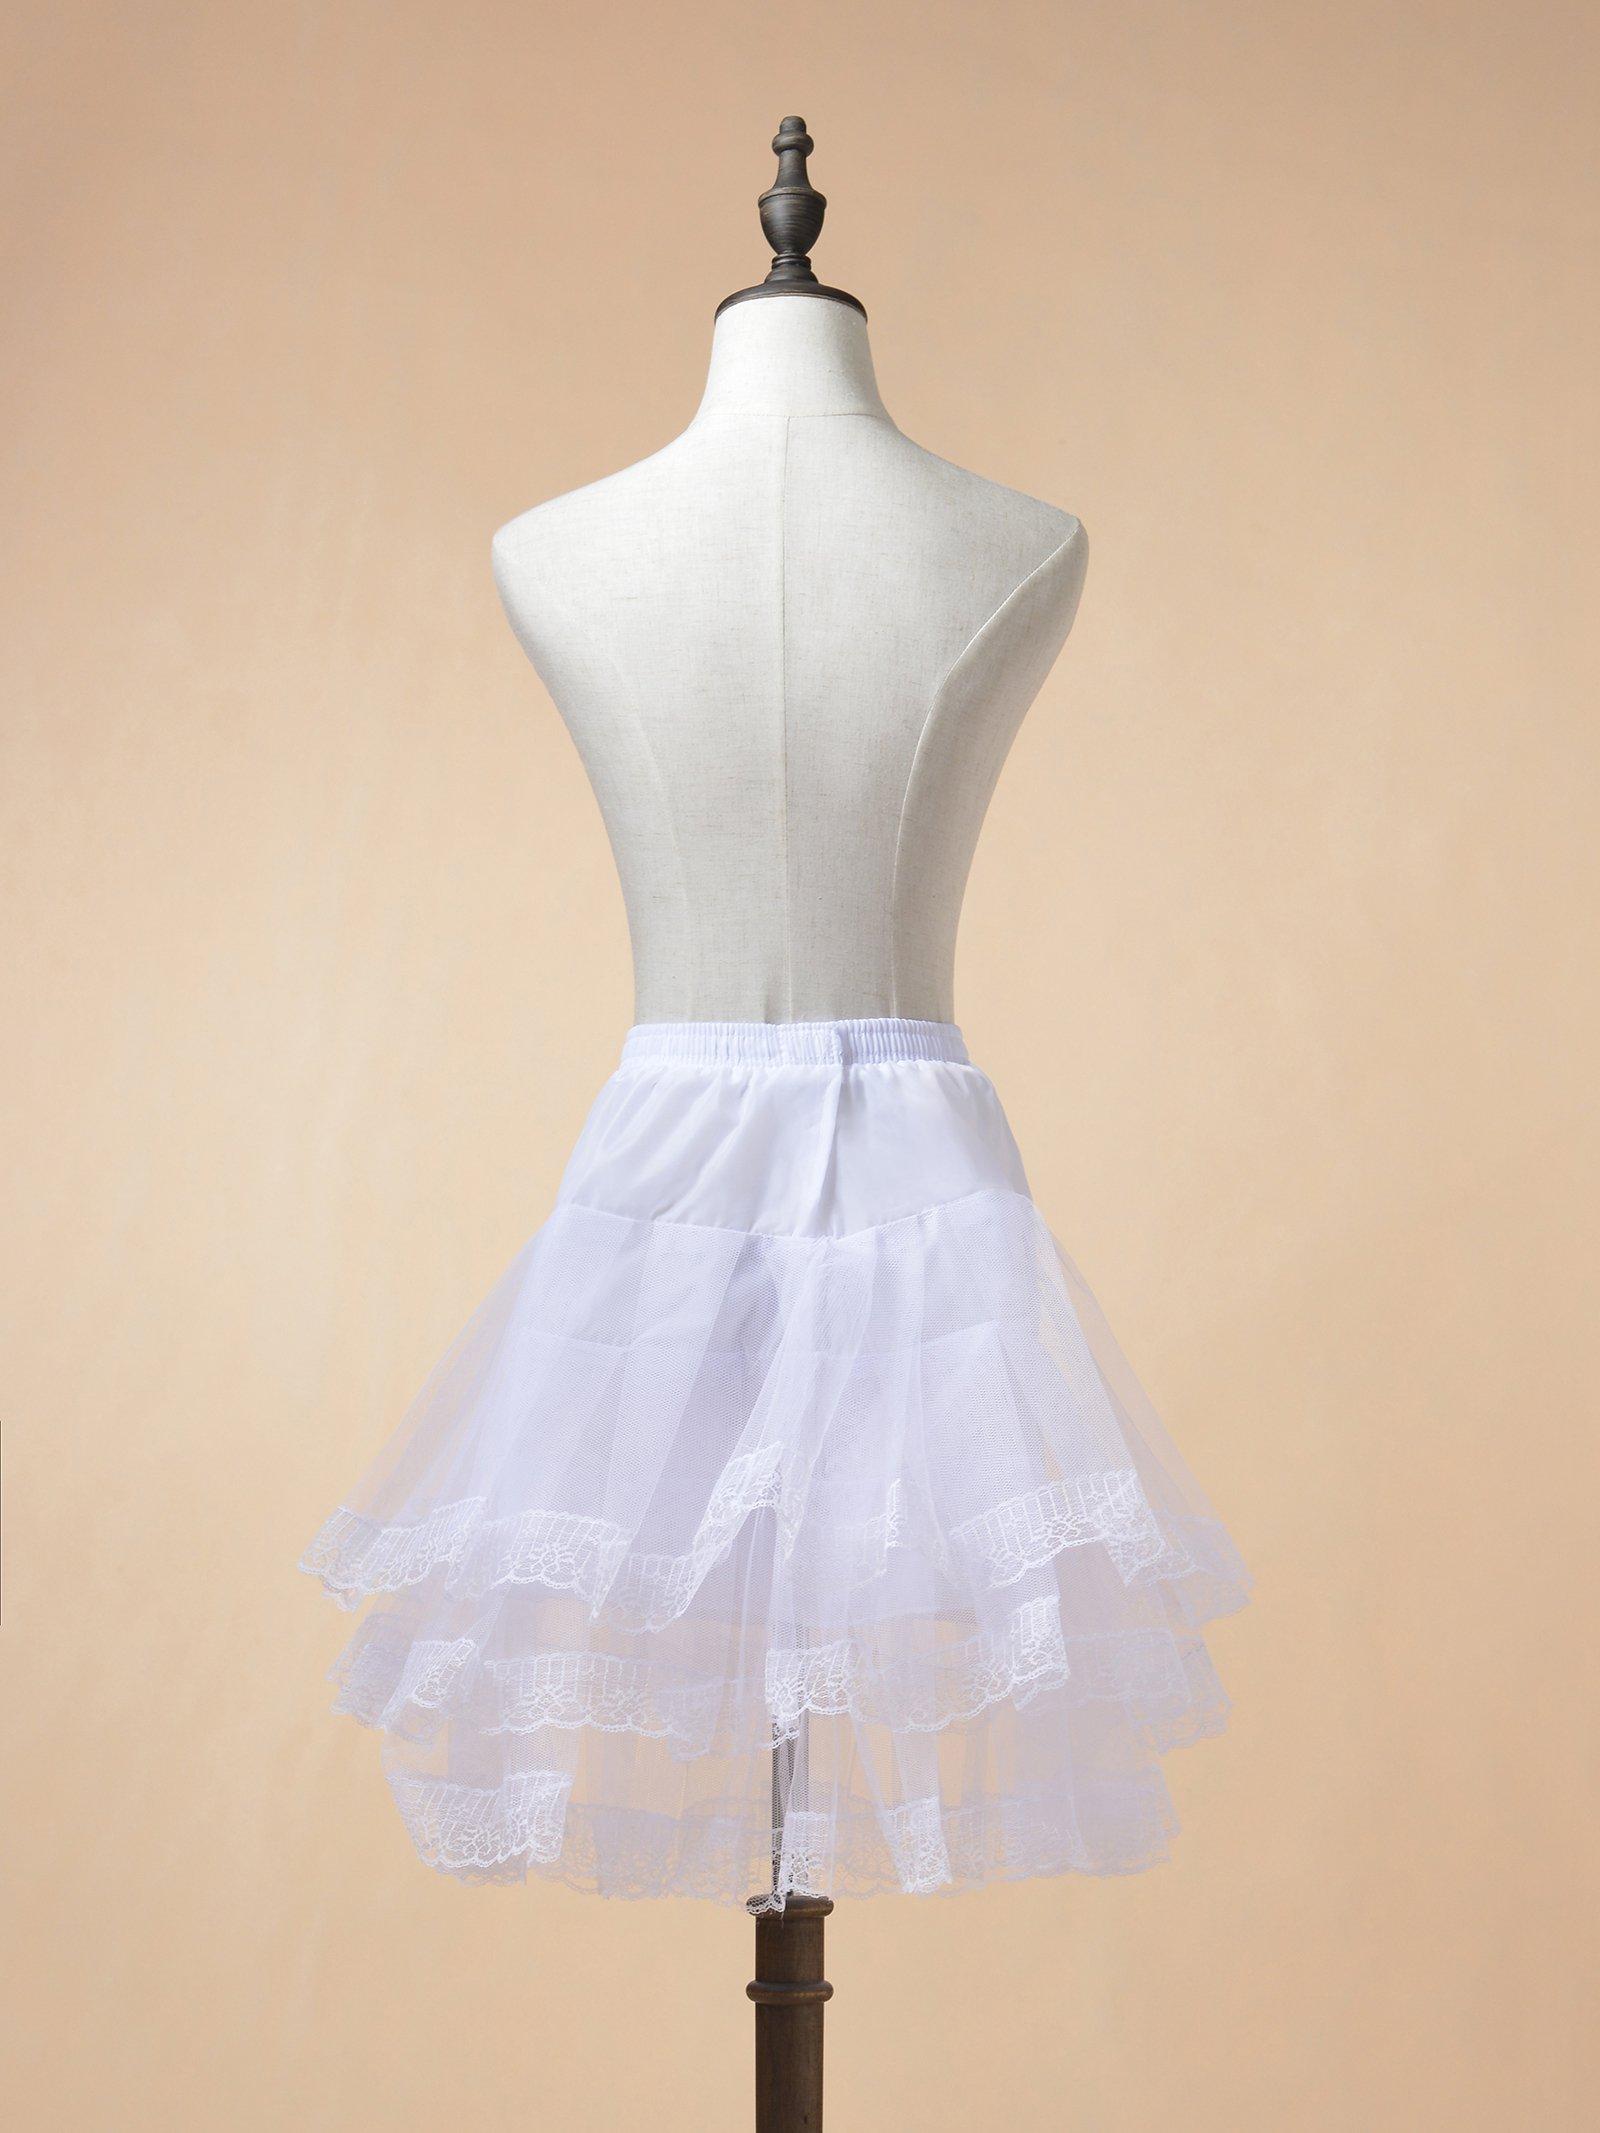 Remedios Kids Mini White Petticoat Flower Girl Wedding Underskirt Cocktail Dress Crinoline Slip White by Remedios (Image #5)